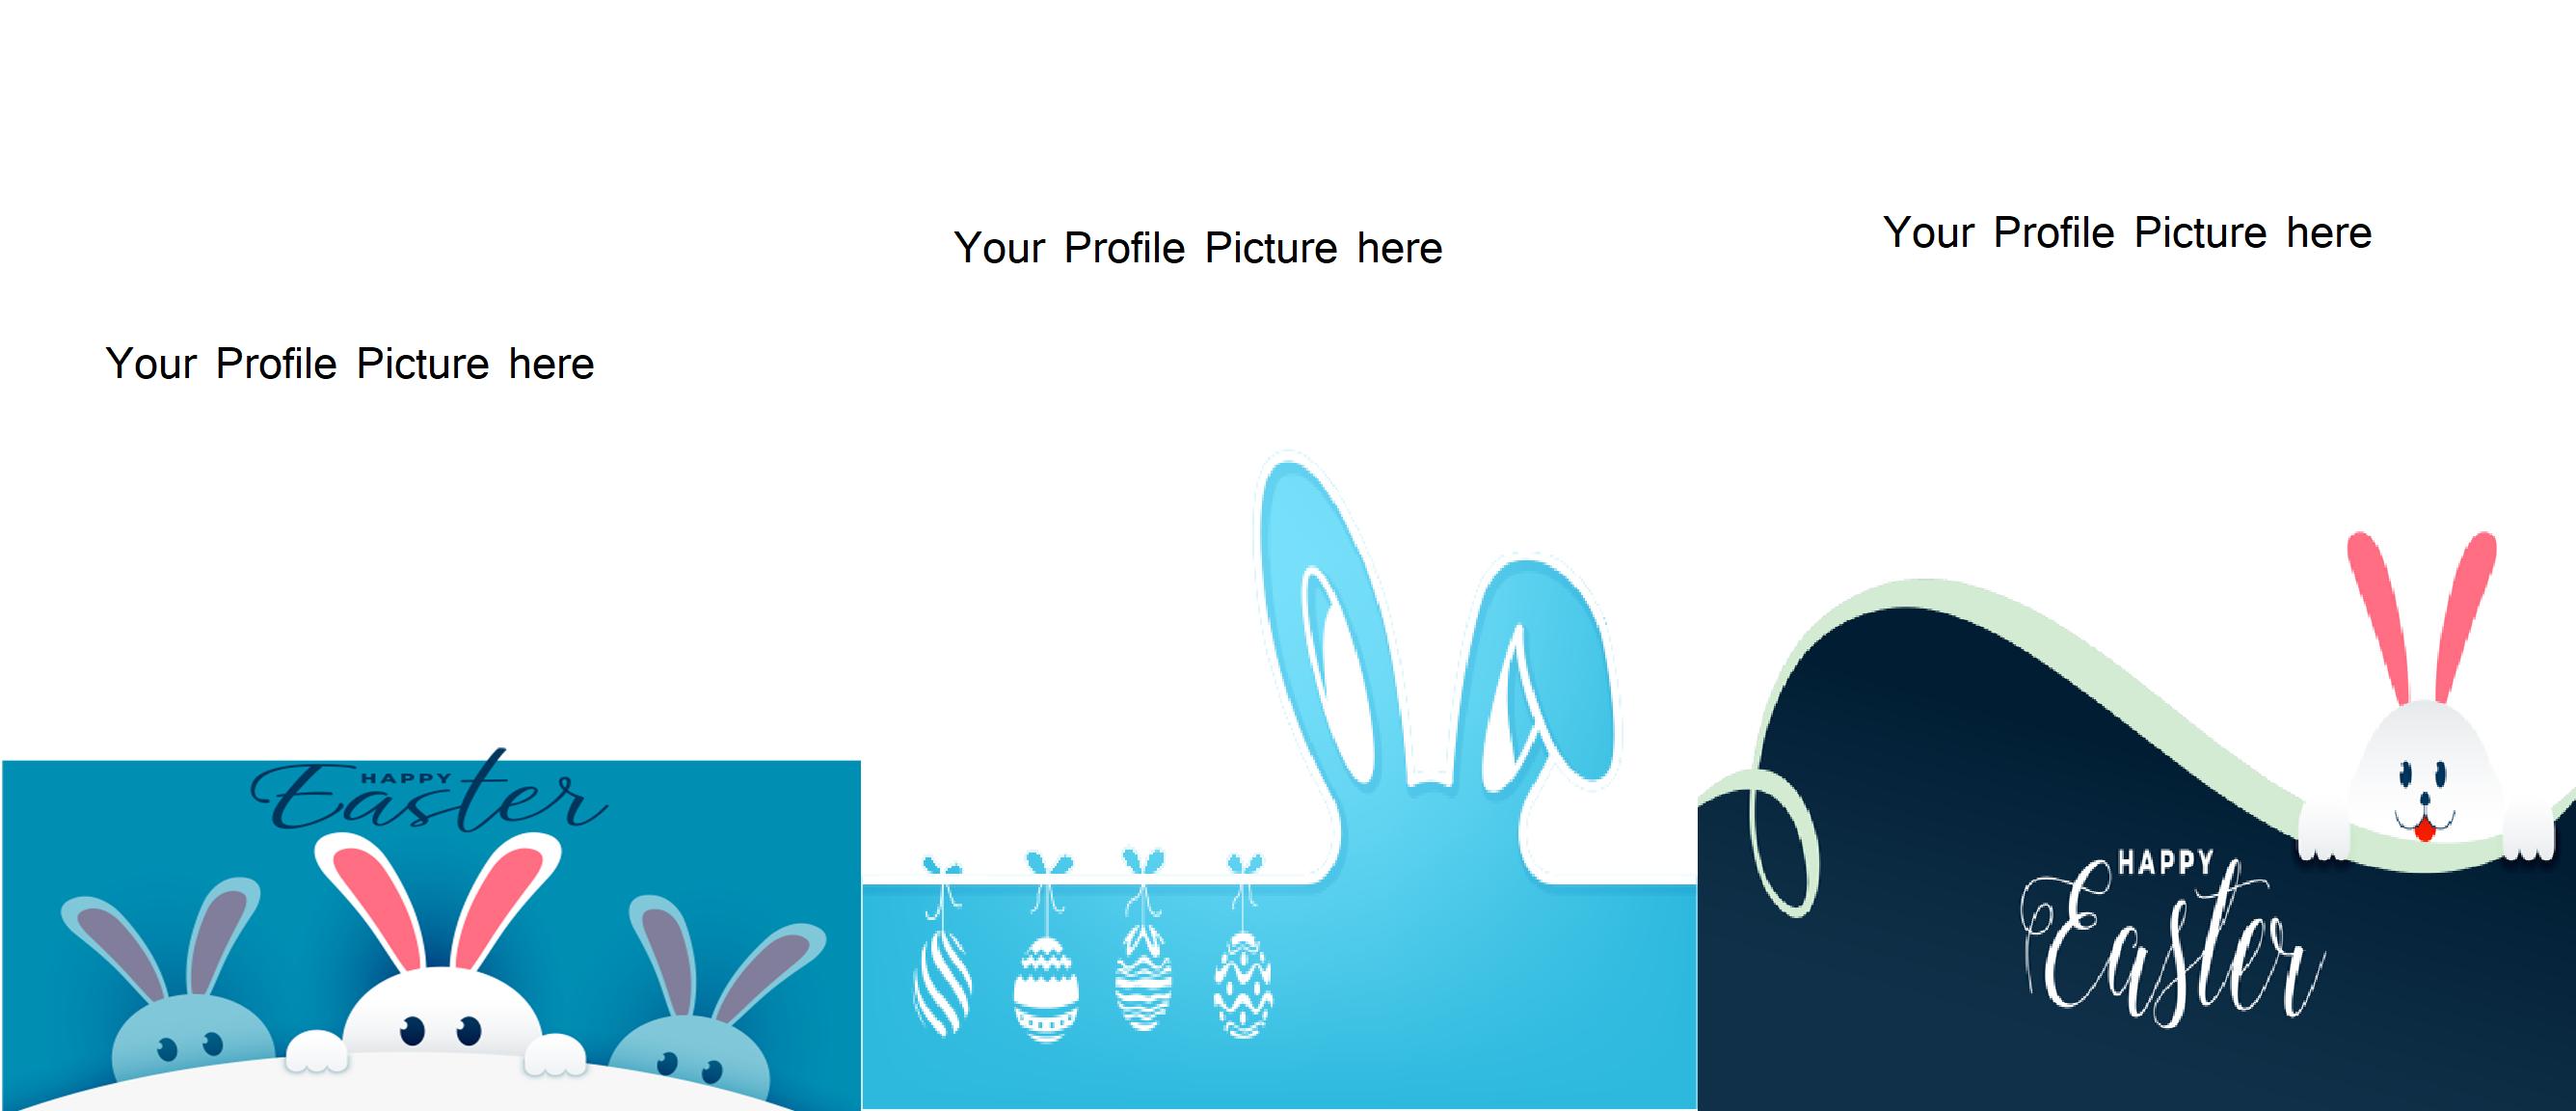 Easter bunny profile frame